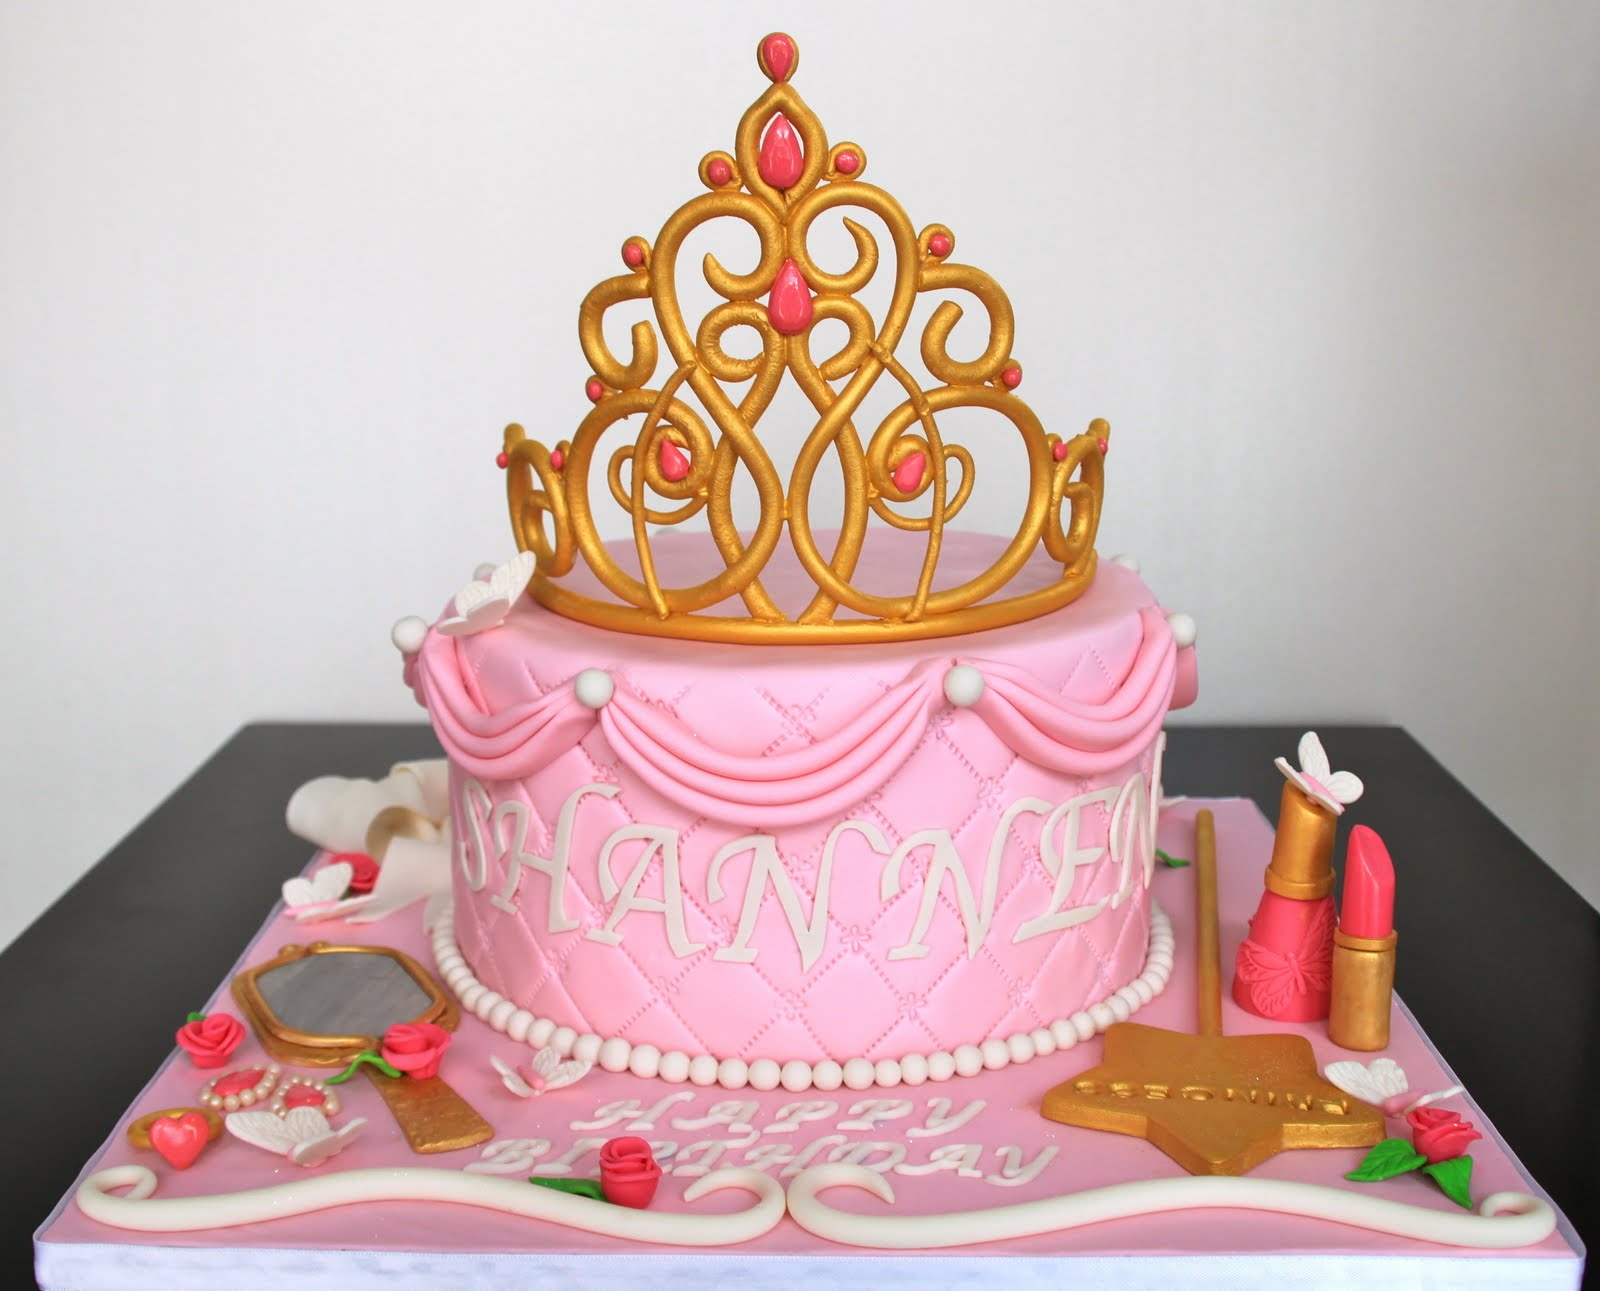 Princess Crown Cake Images : Celebrate with Cake!: Princess Tiara Cake